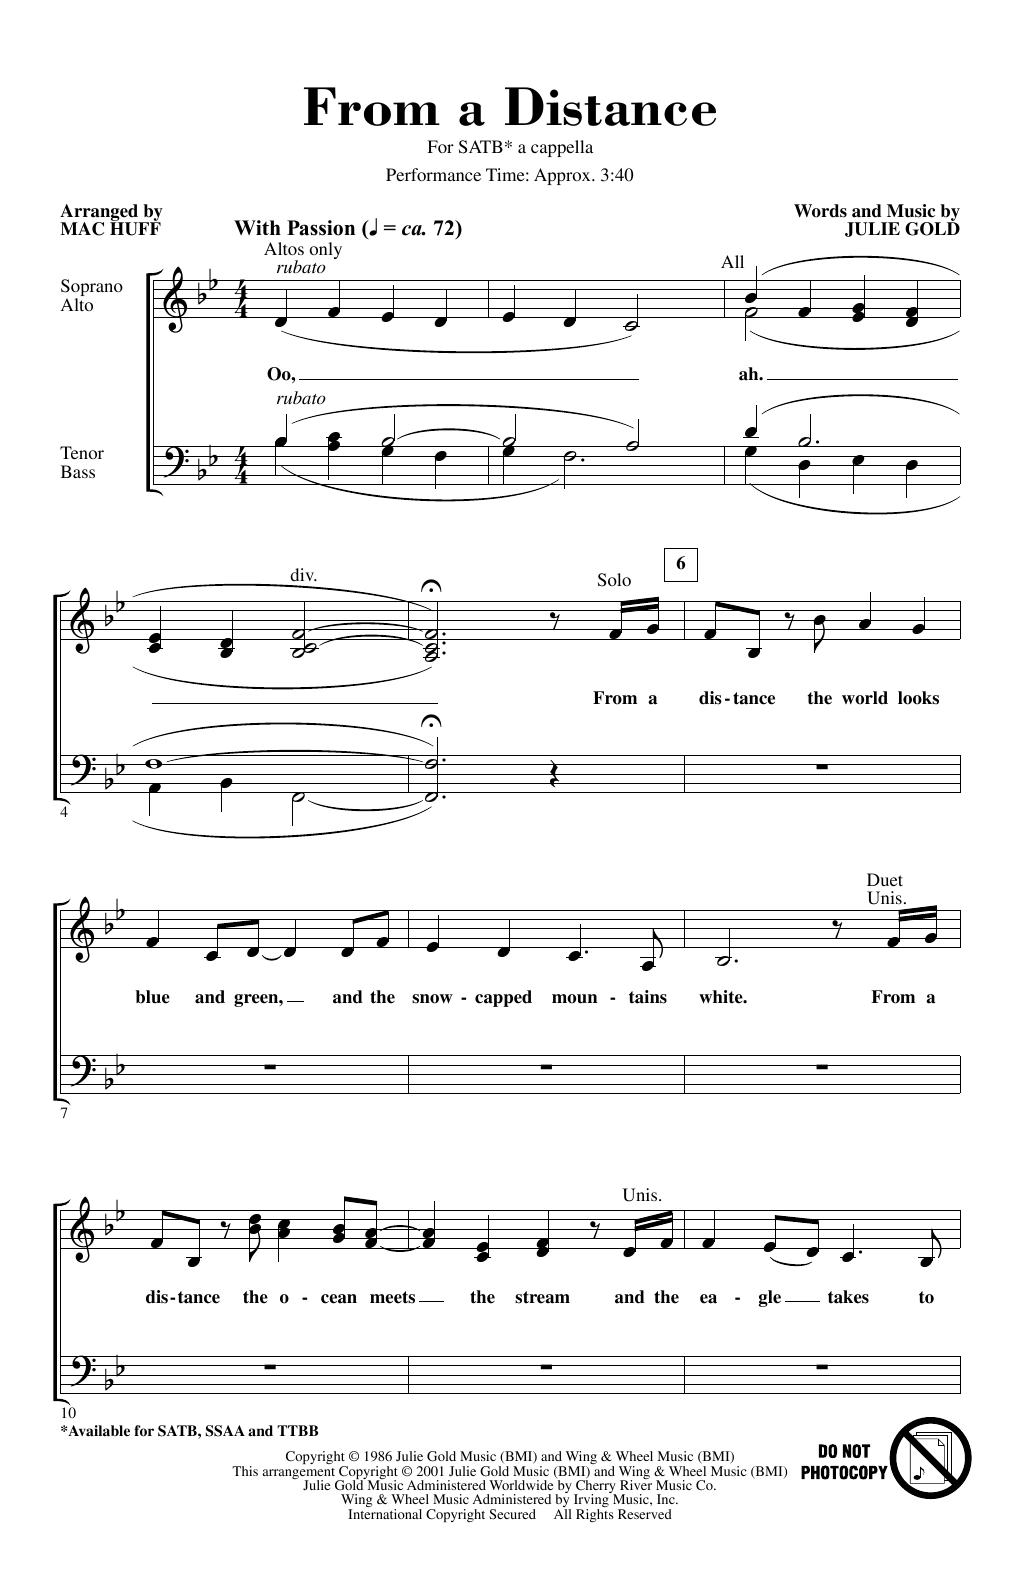 From A Distance (arr. Mac Huff) (SATB Choir)